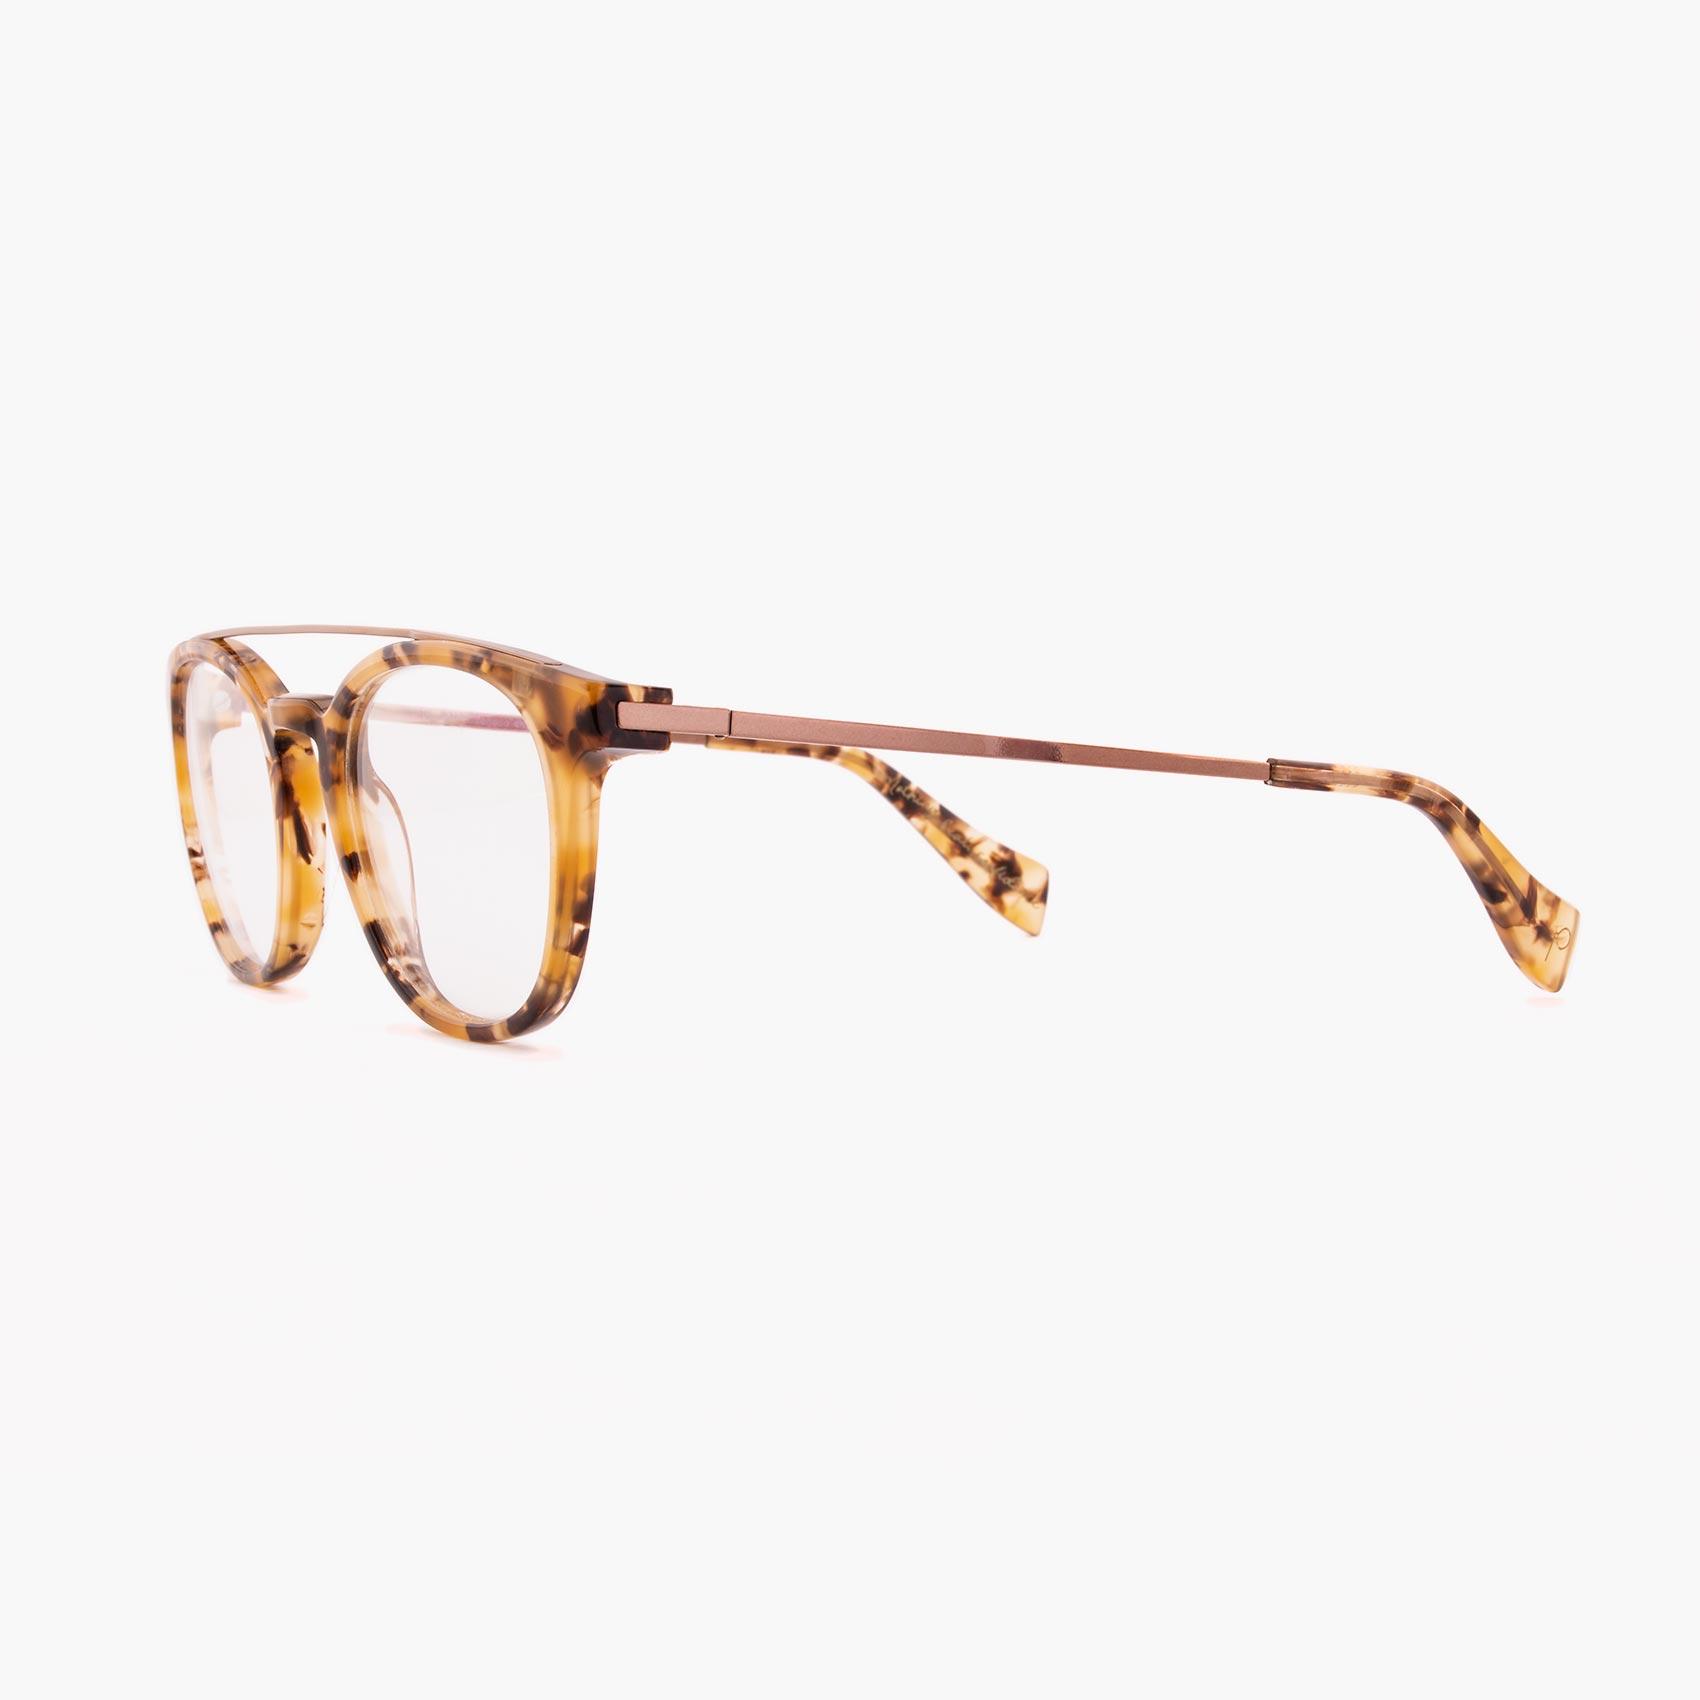 Proud eyewear Hilary C3 L montura gafas puente doble